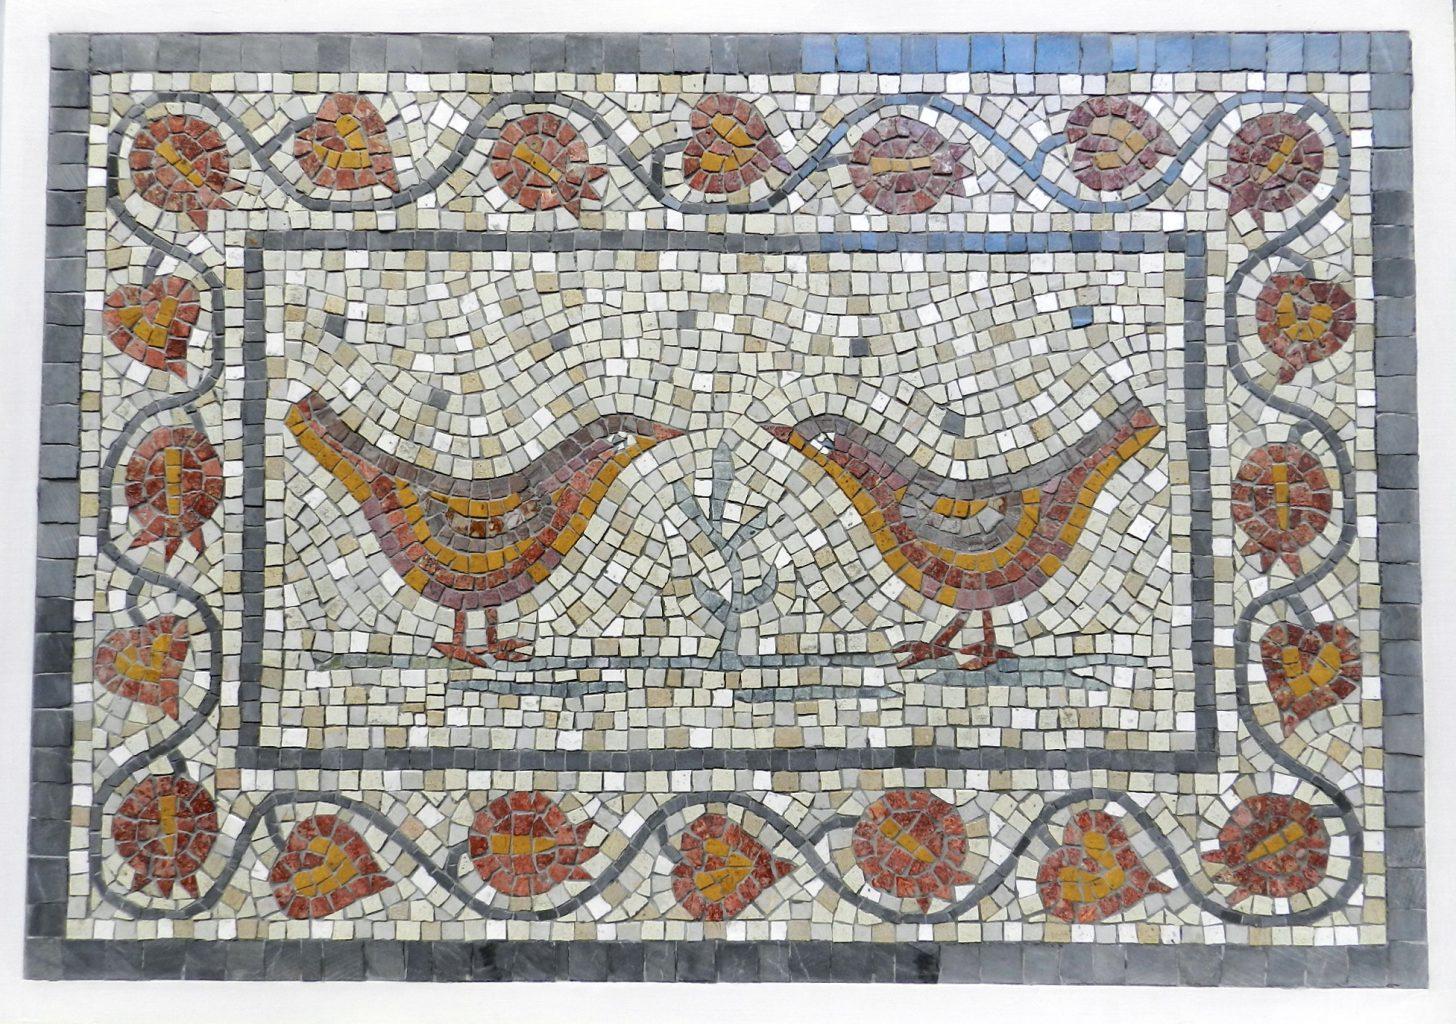 On making a wedding mosaic